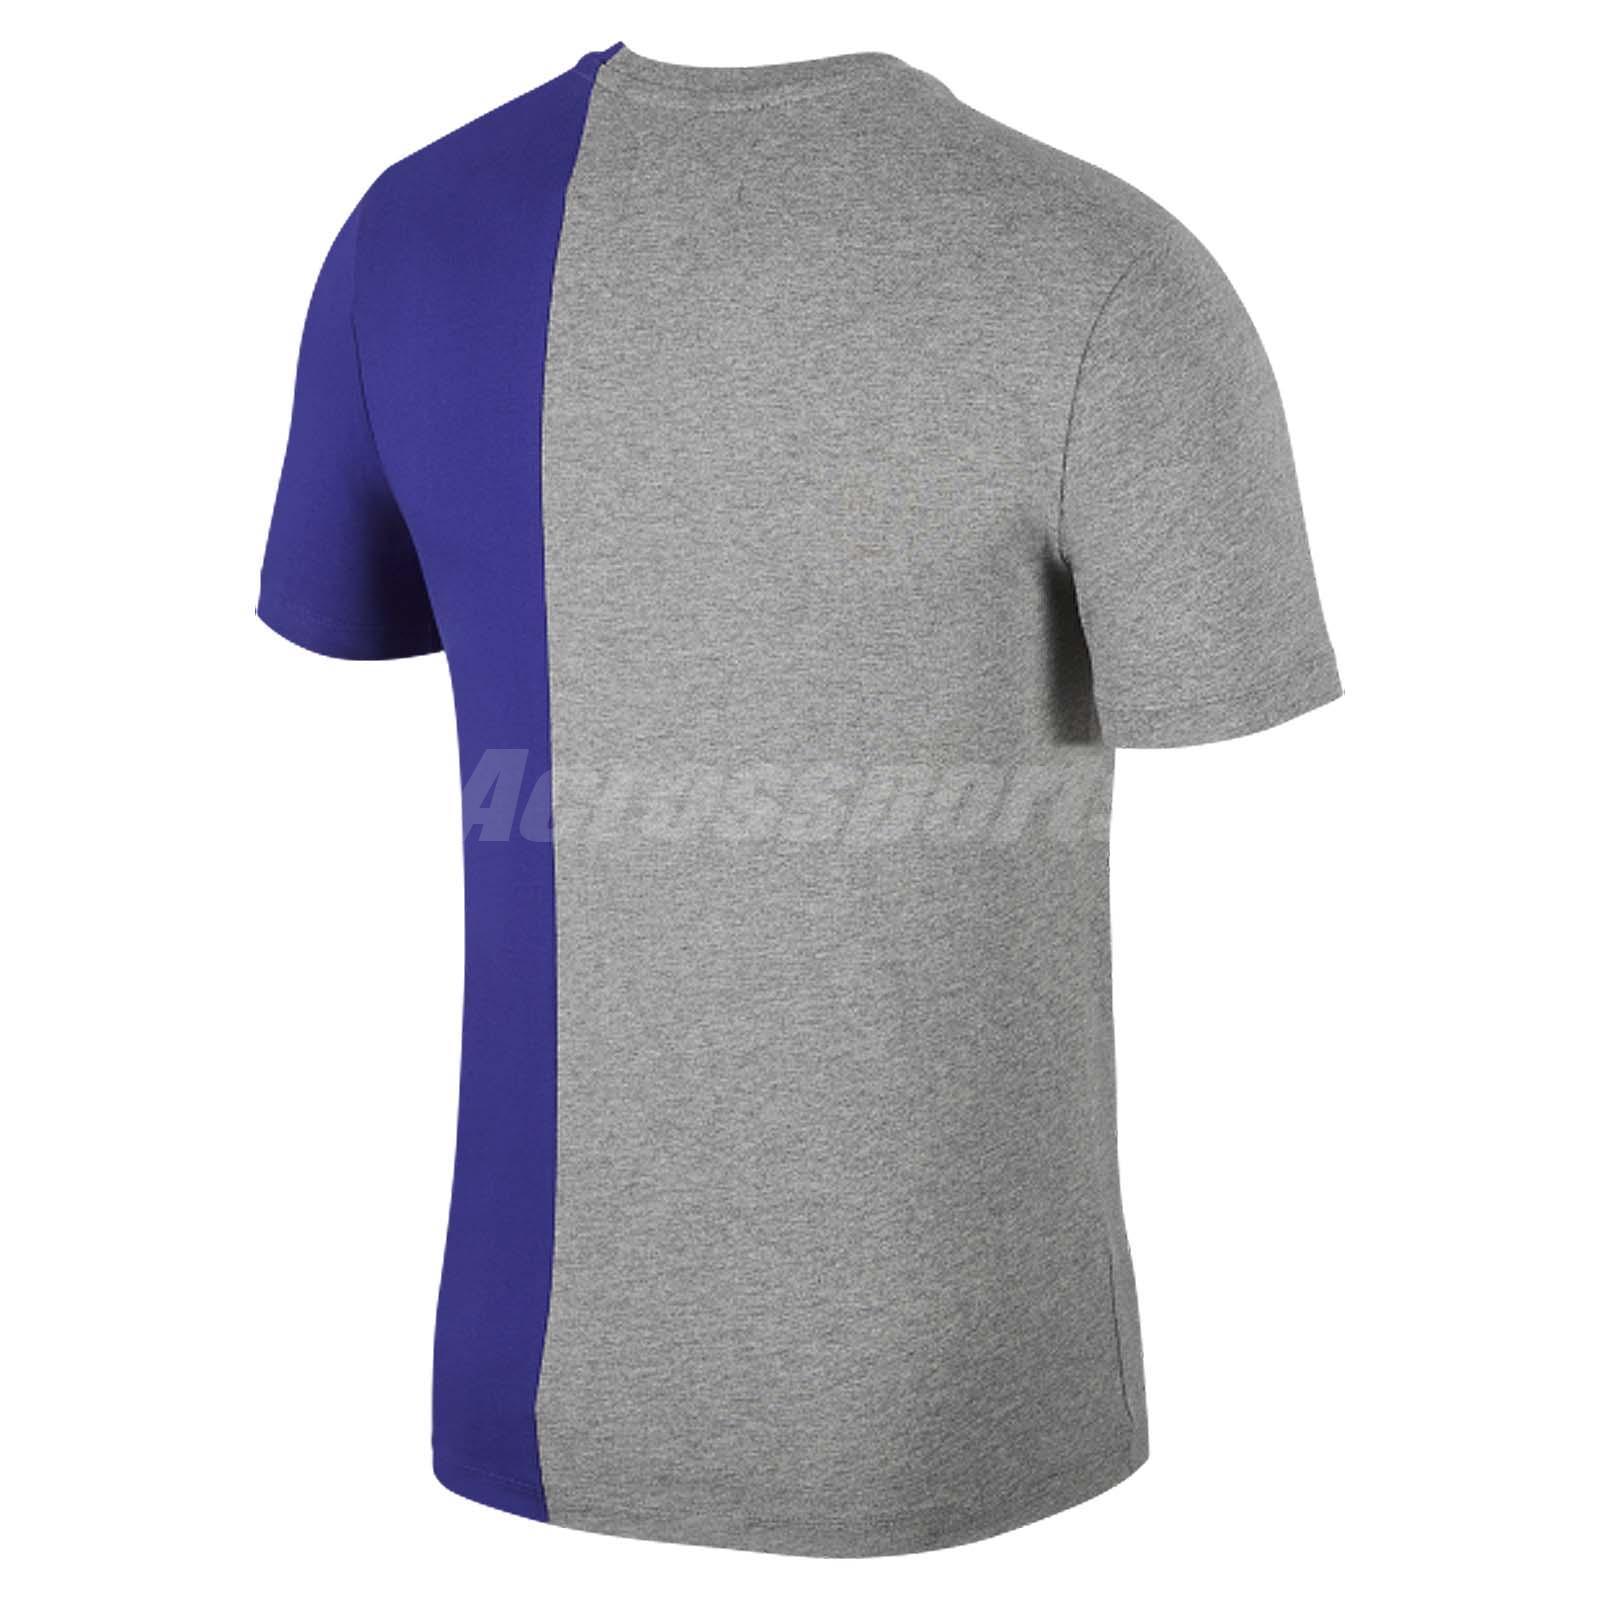 Clothing, Shoes & Accessories Nike Men Jordan Sportswear Legacy Aj 11 Grey Black Basketball Running Bq0198-091